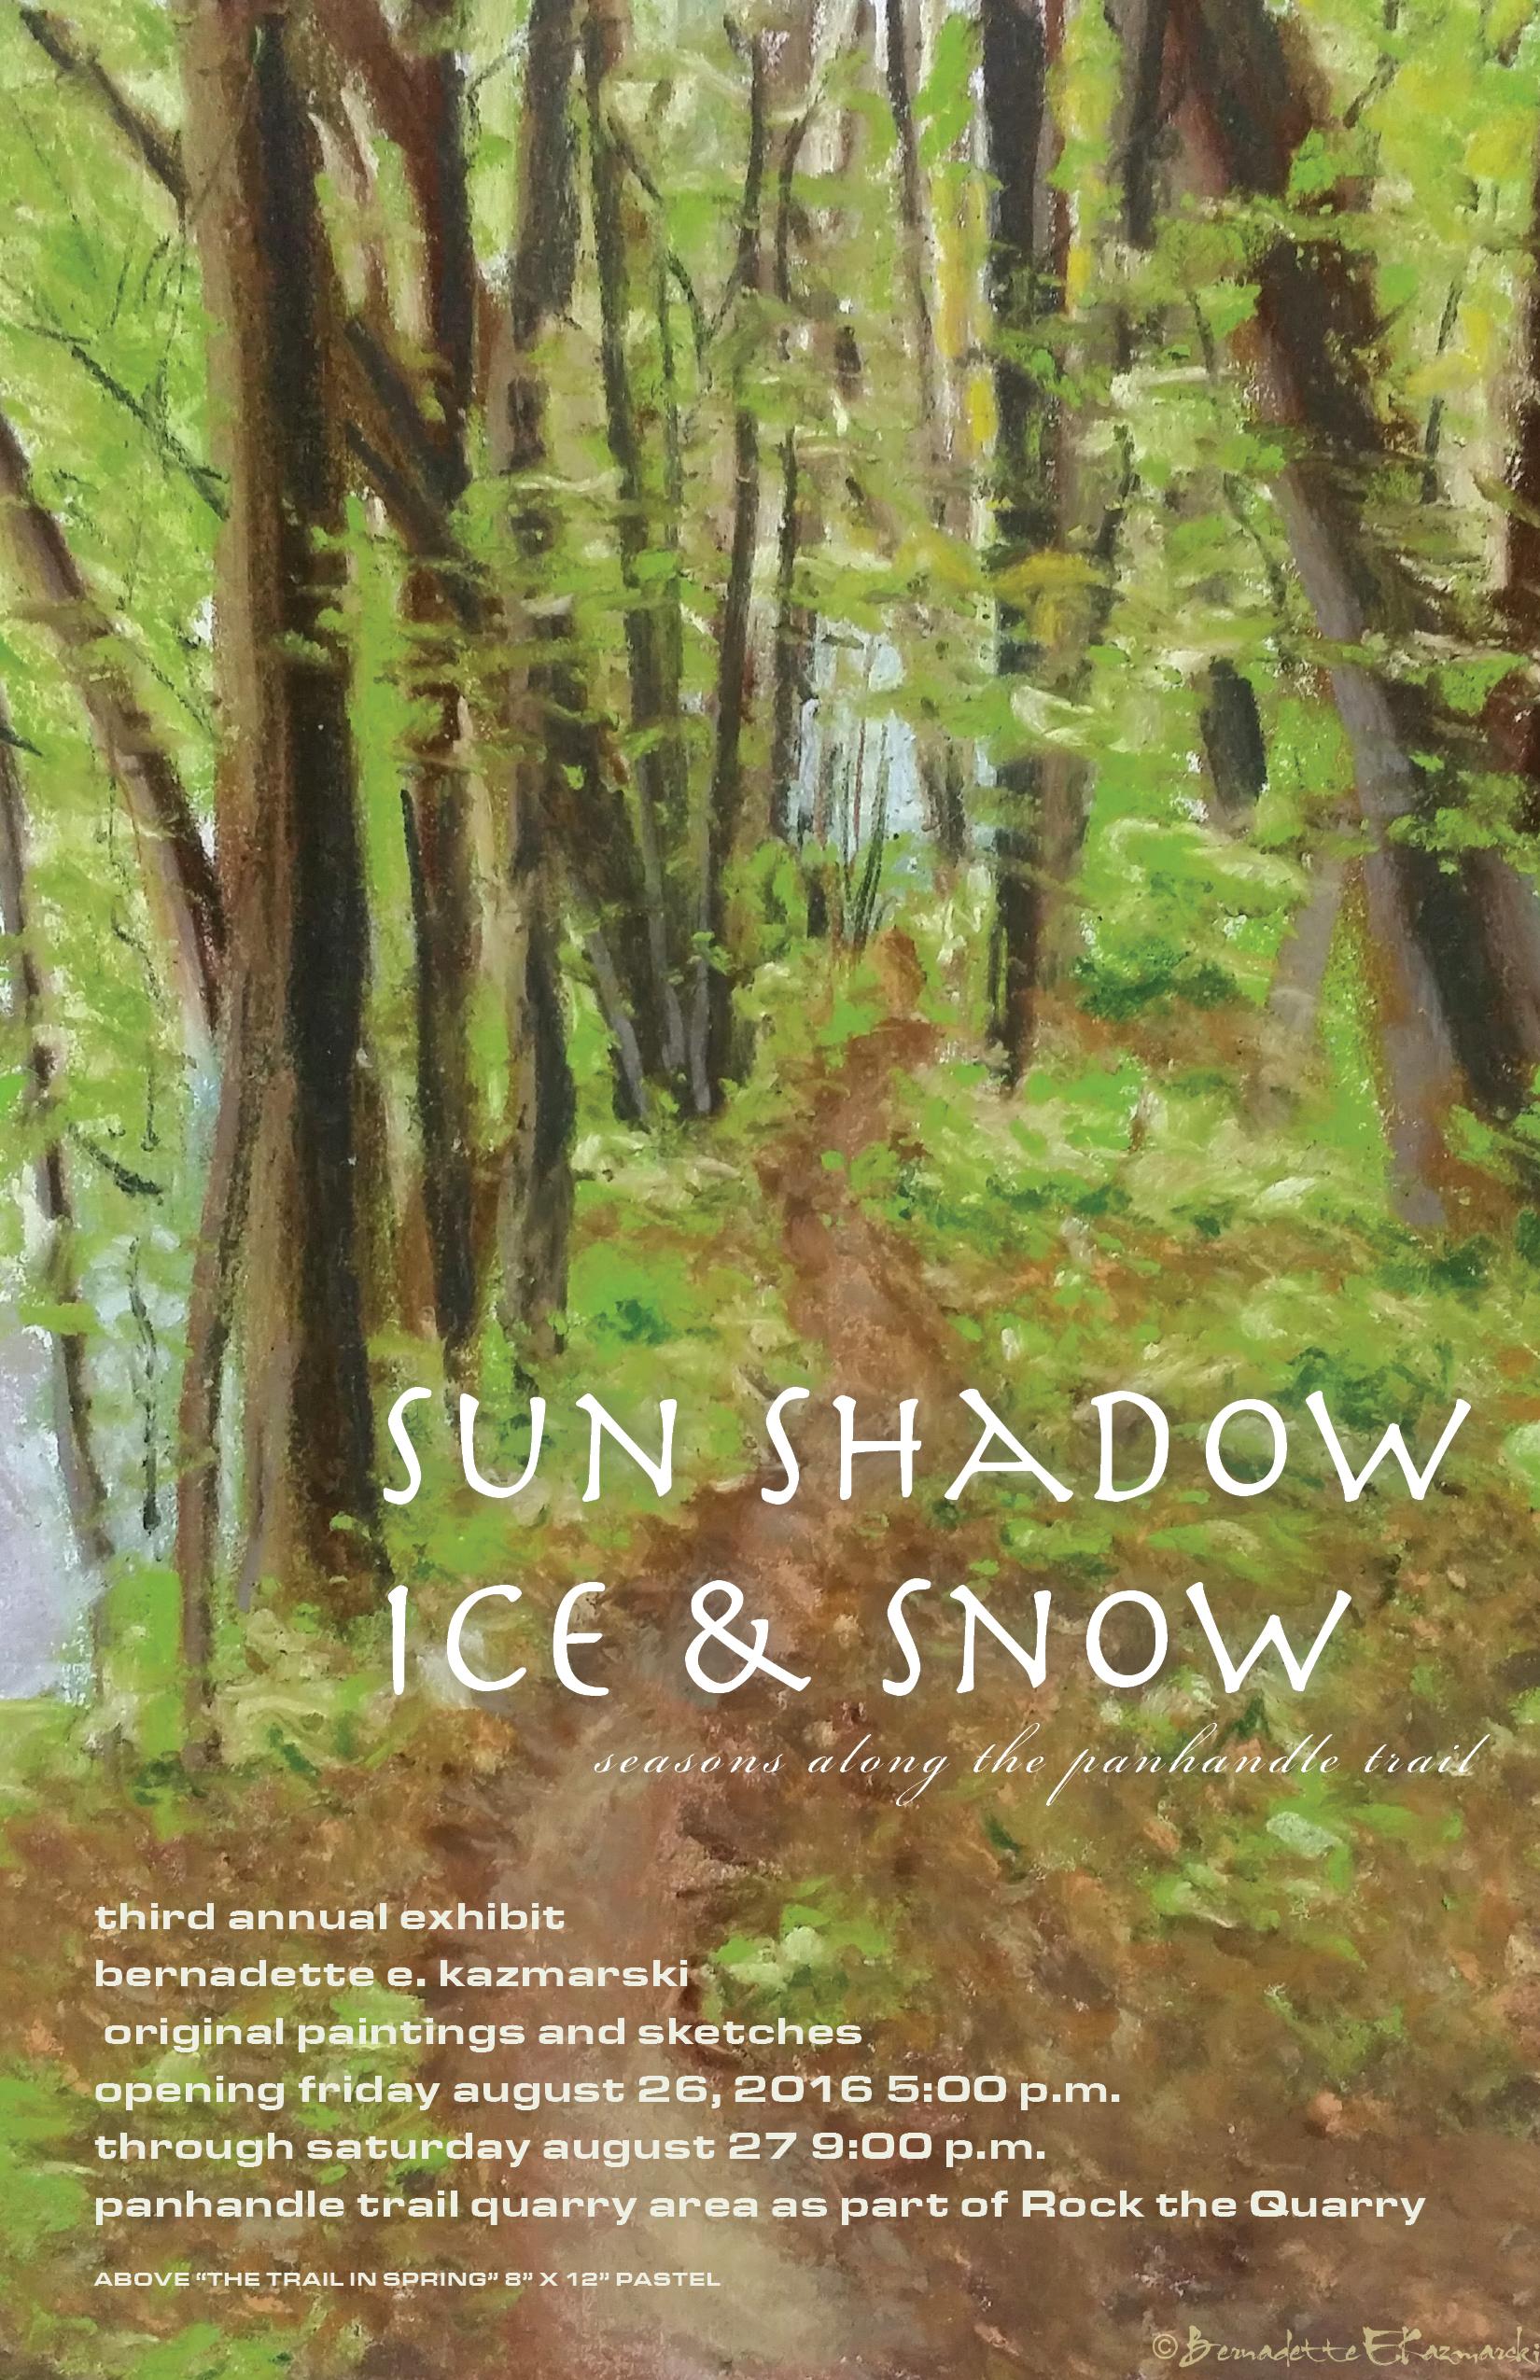 Sun Shadow Ice & Snow: Seasons Along the Panhandle Trail 2016